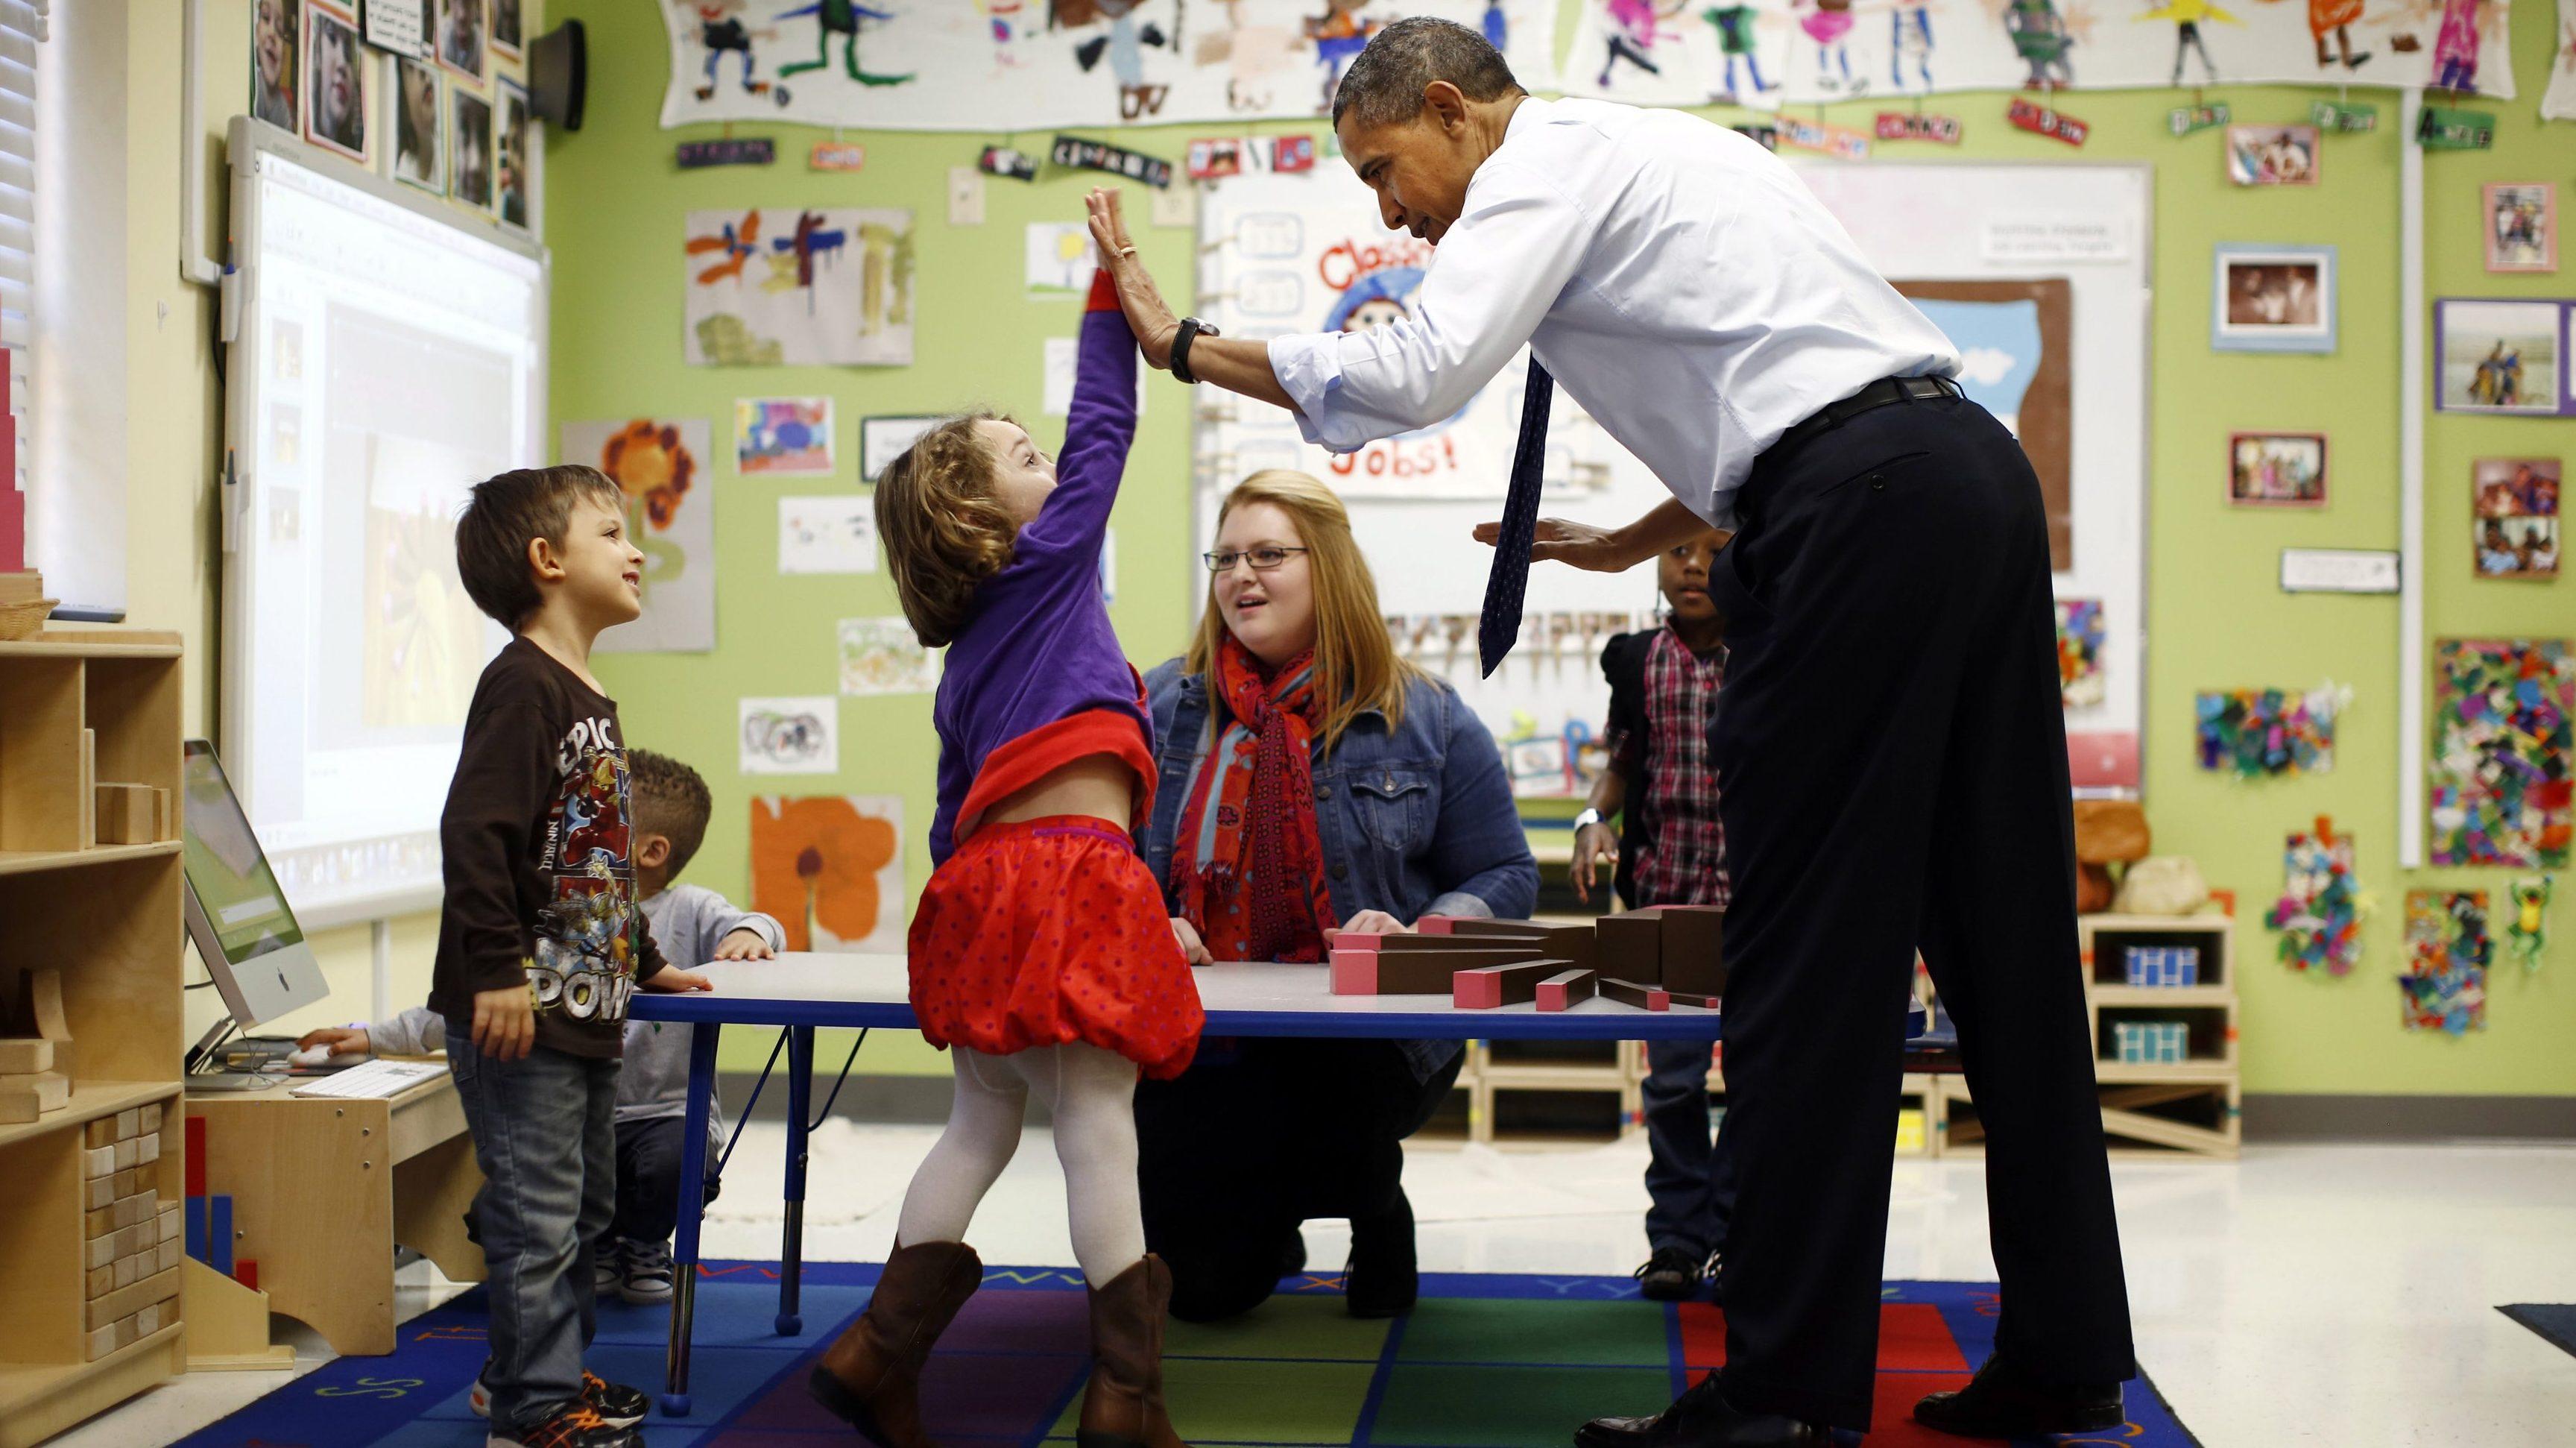 Barack Obama high-fives children in a pre-kindergarten classroom